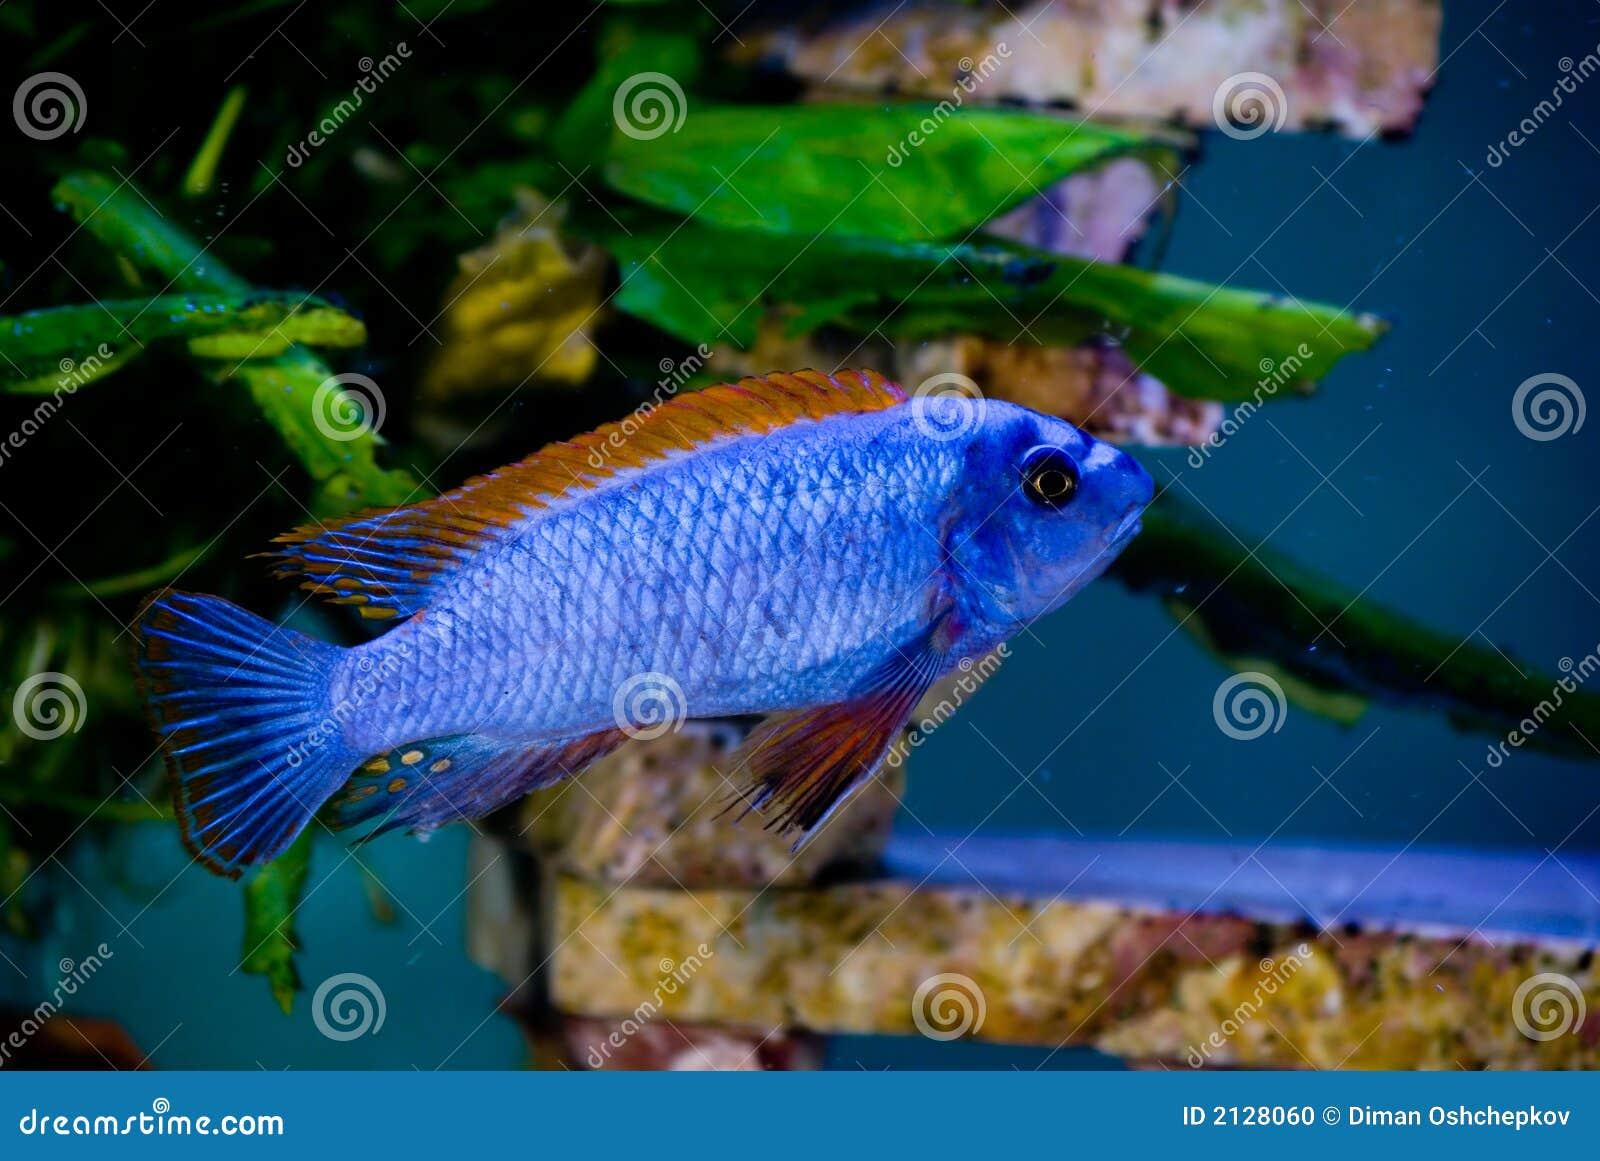 Blue fish red fins 3 stock photo image 2128060 for Blue fish aquarium